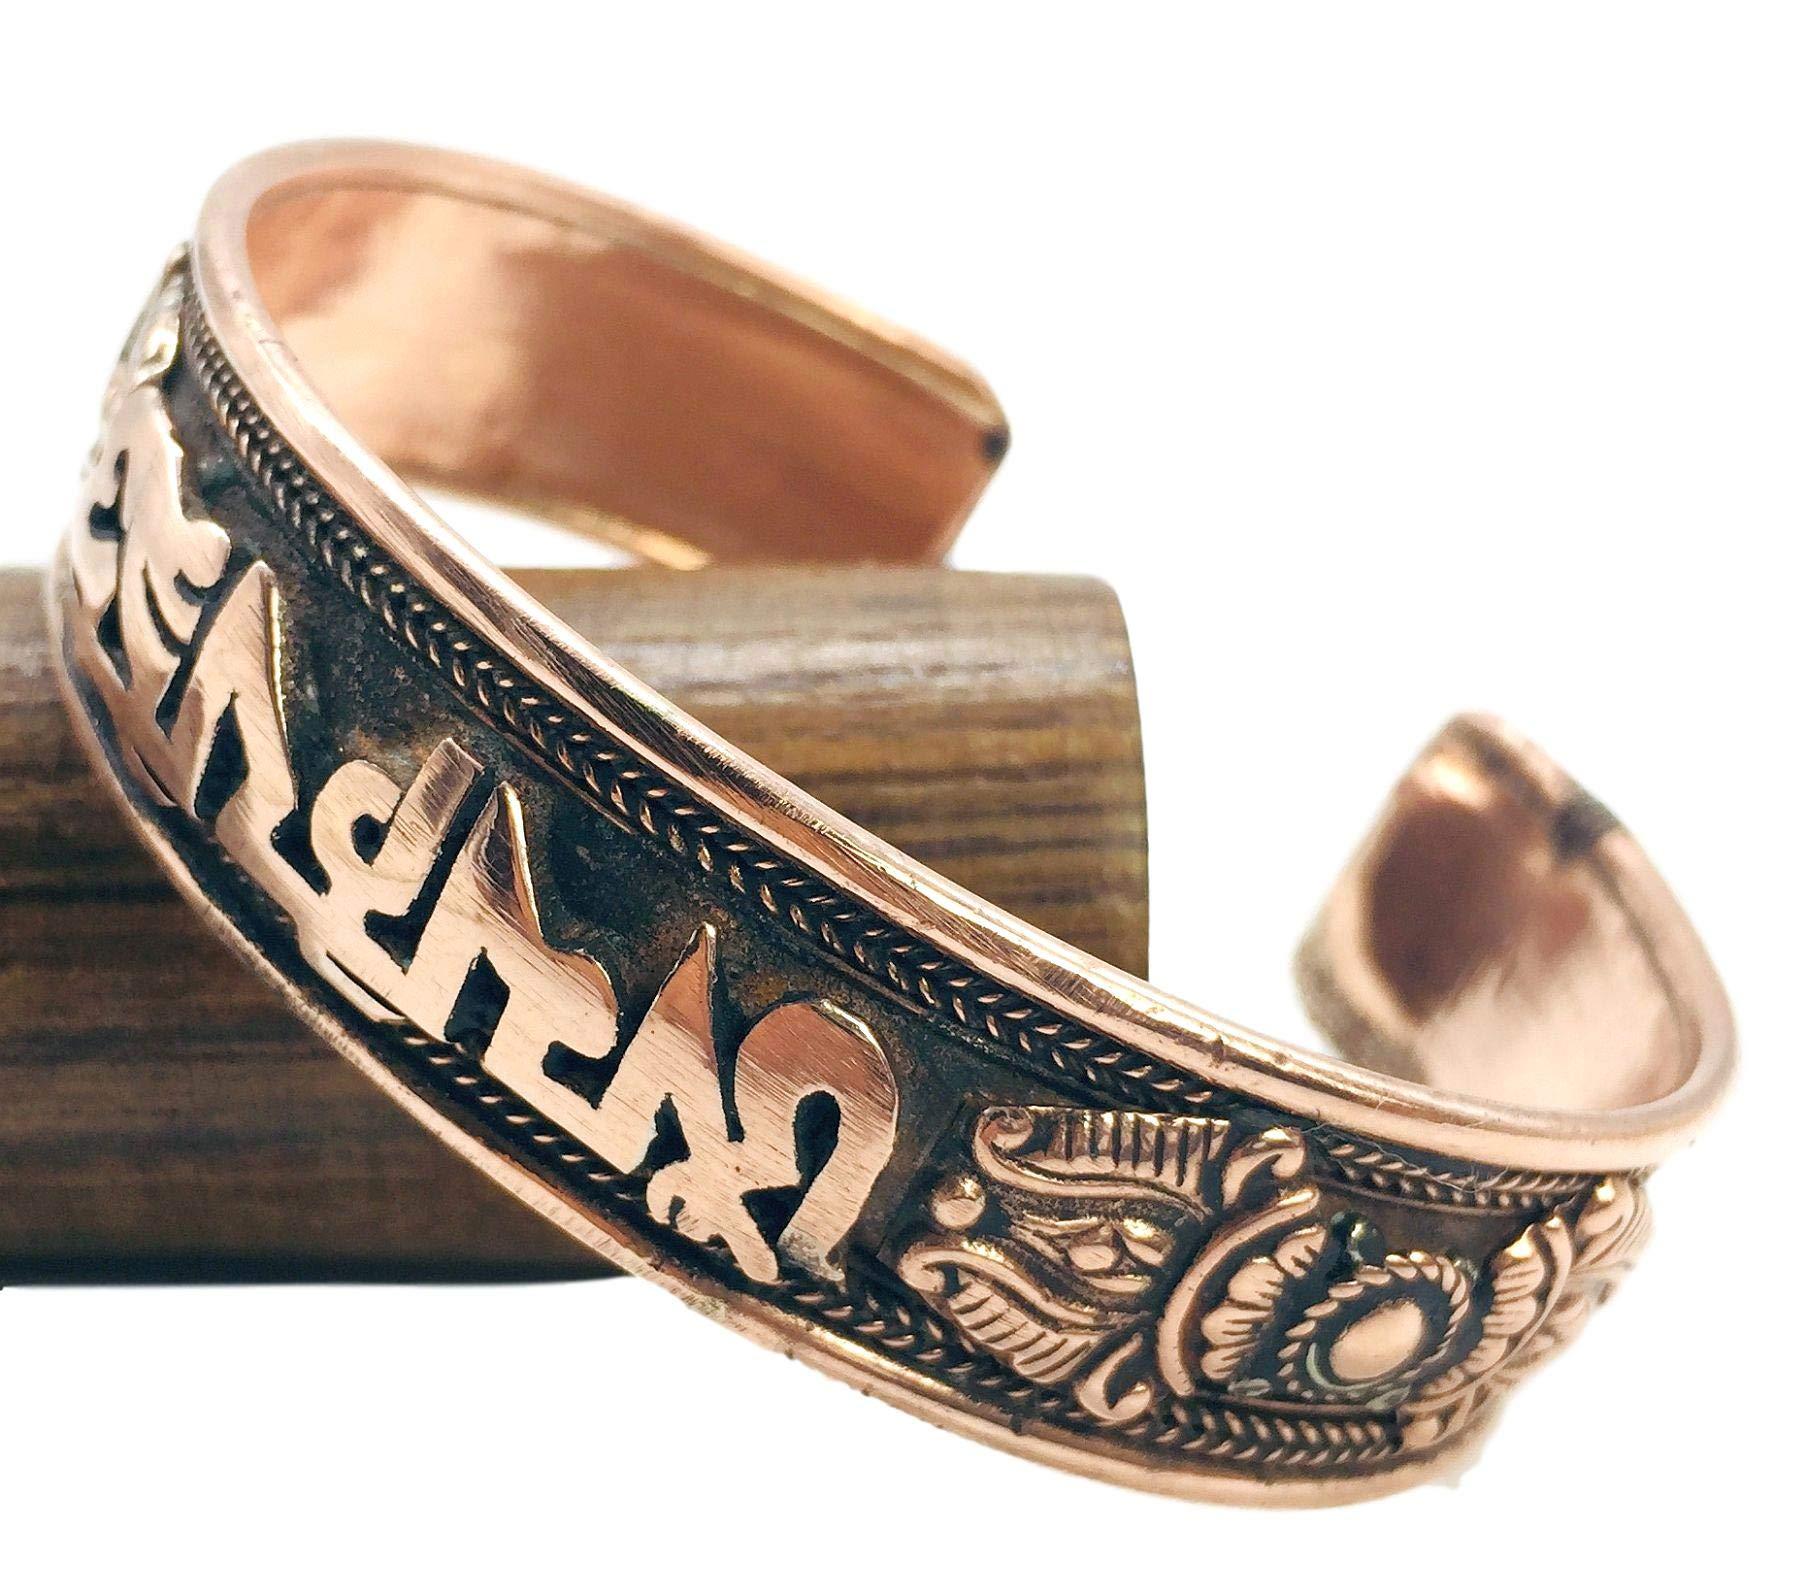 100% Pure Copper Tibetan Healing Bracelet. Unisex, Hand Made High Gauge Copper (Mantra)